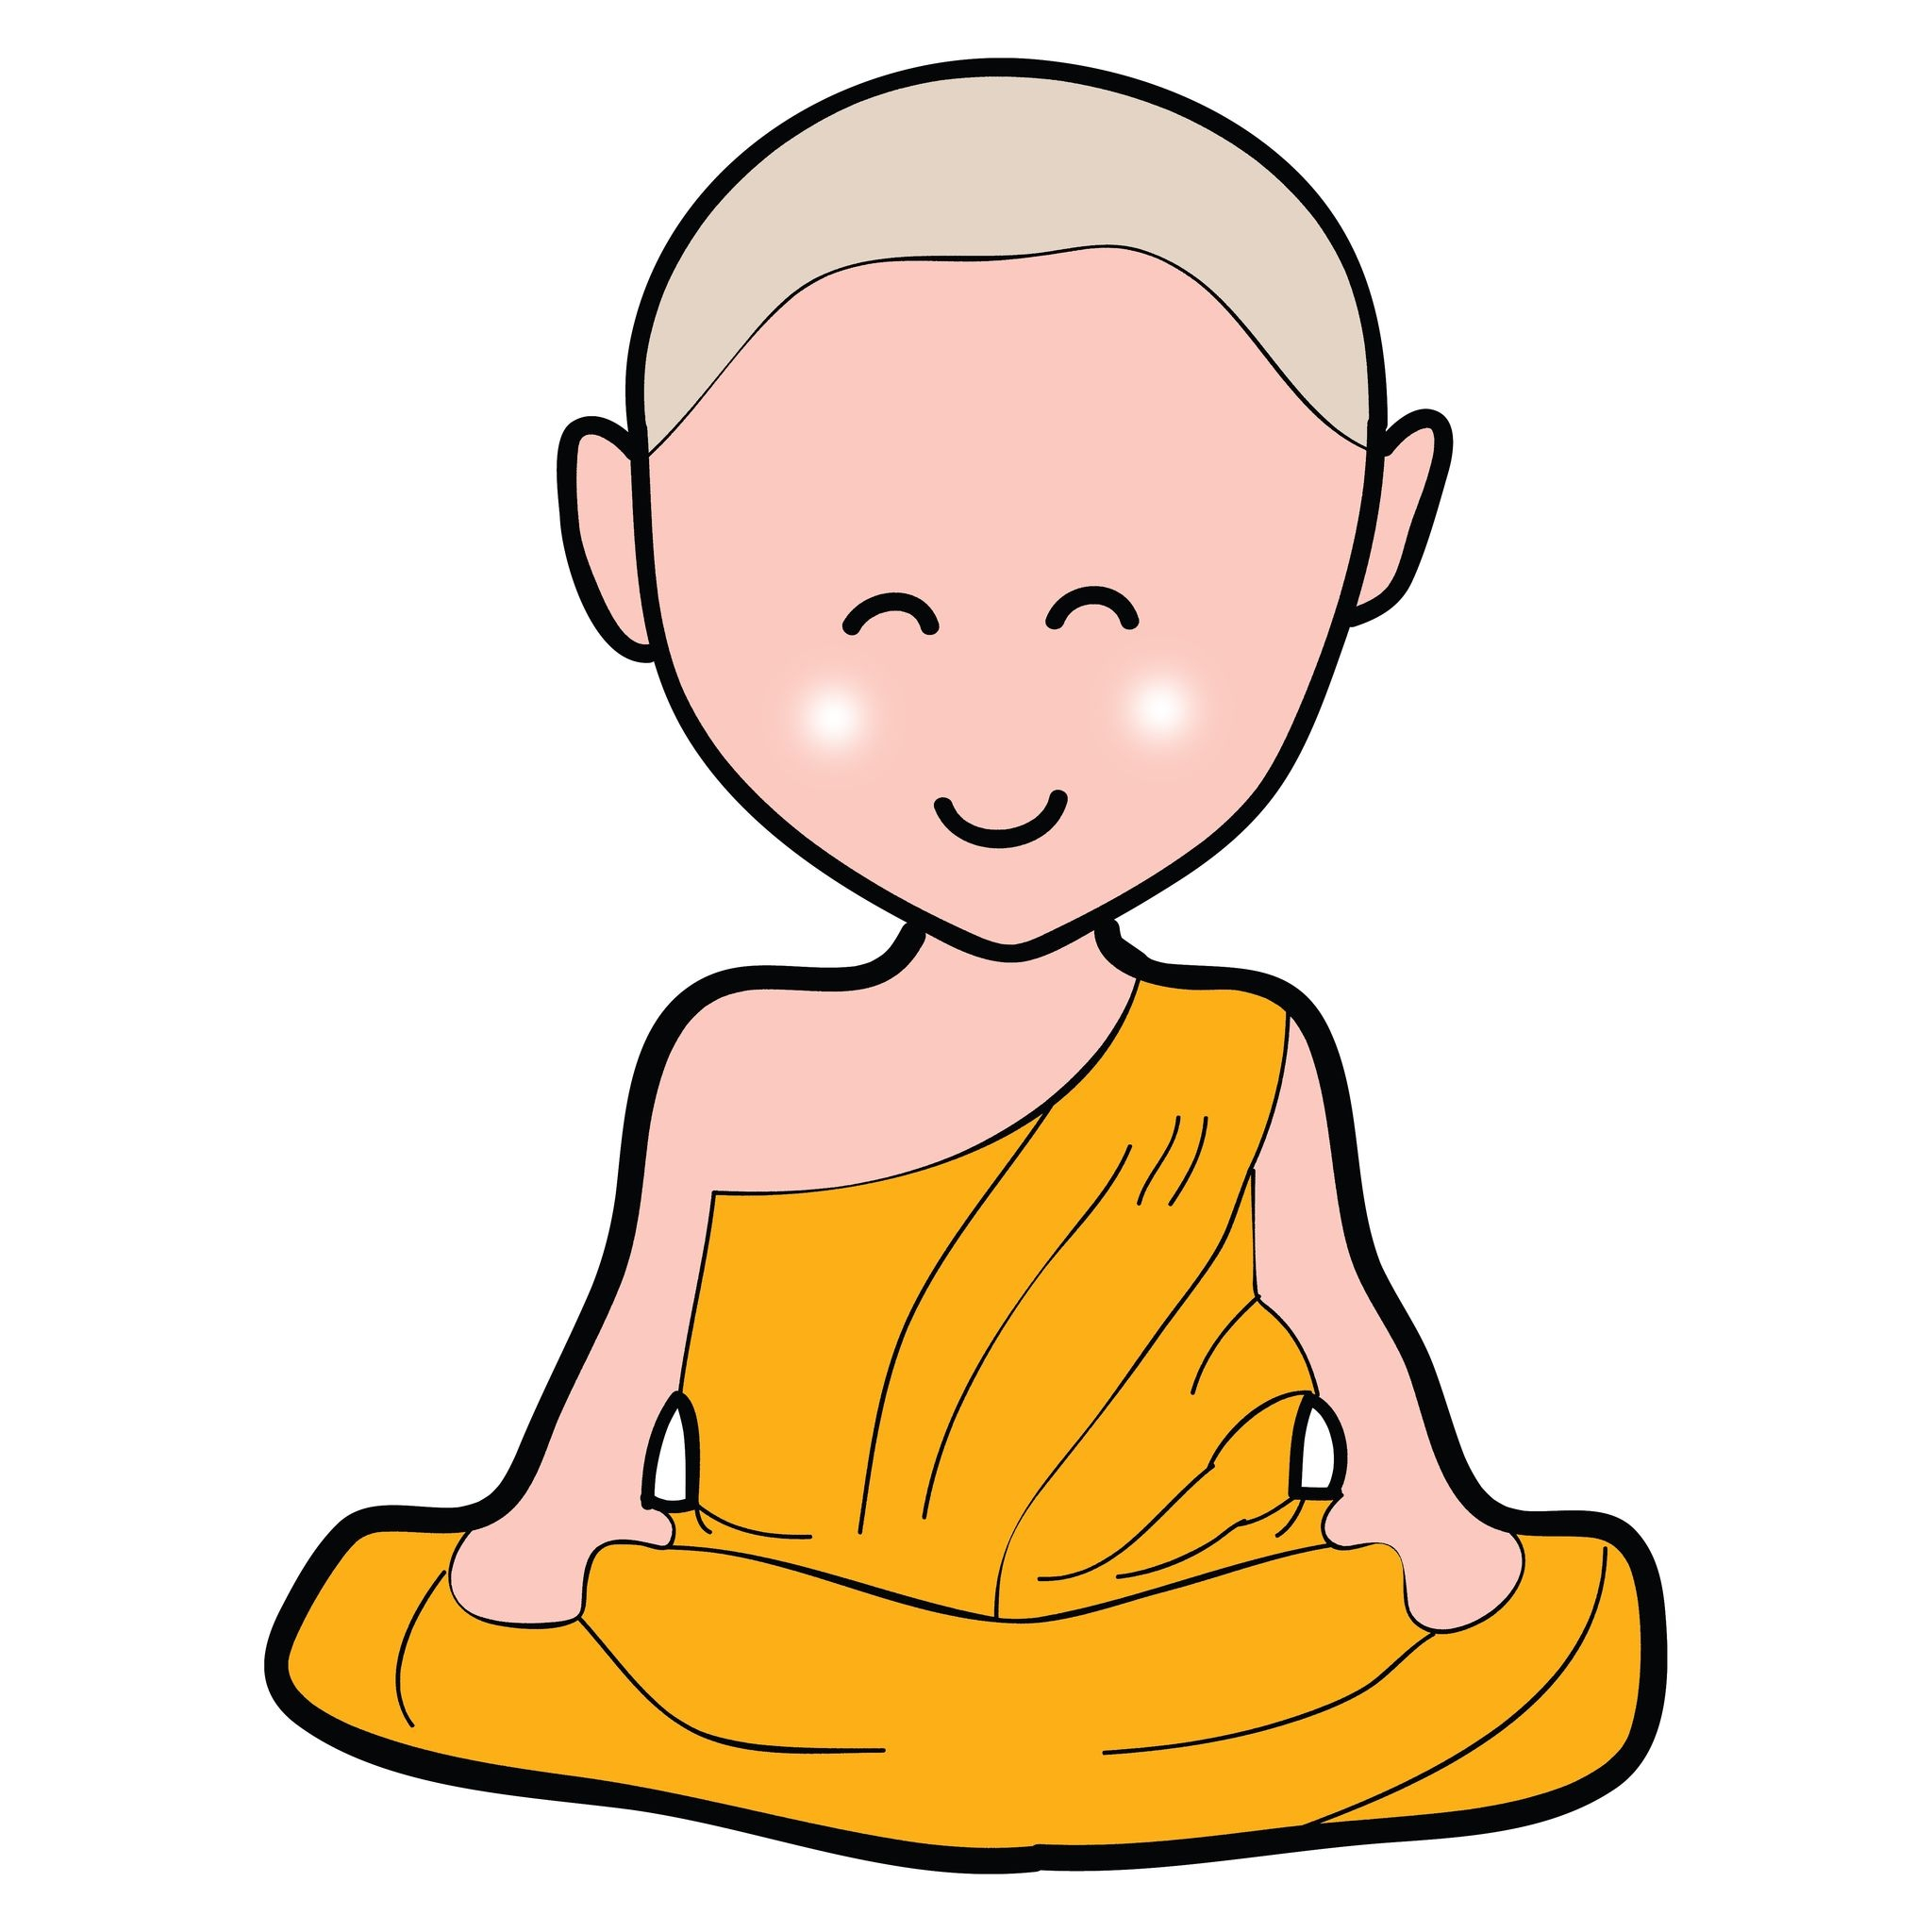 16055586 - buddhist monk cartoon hand drawn illustration